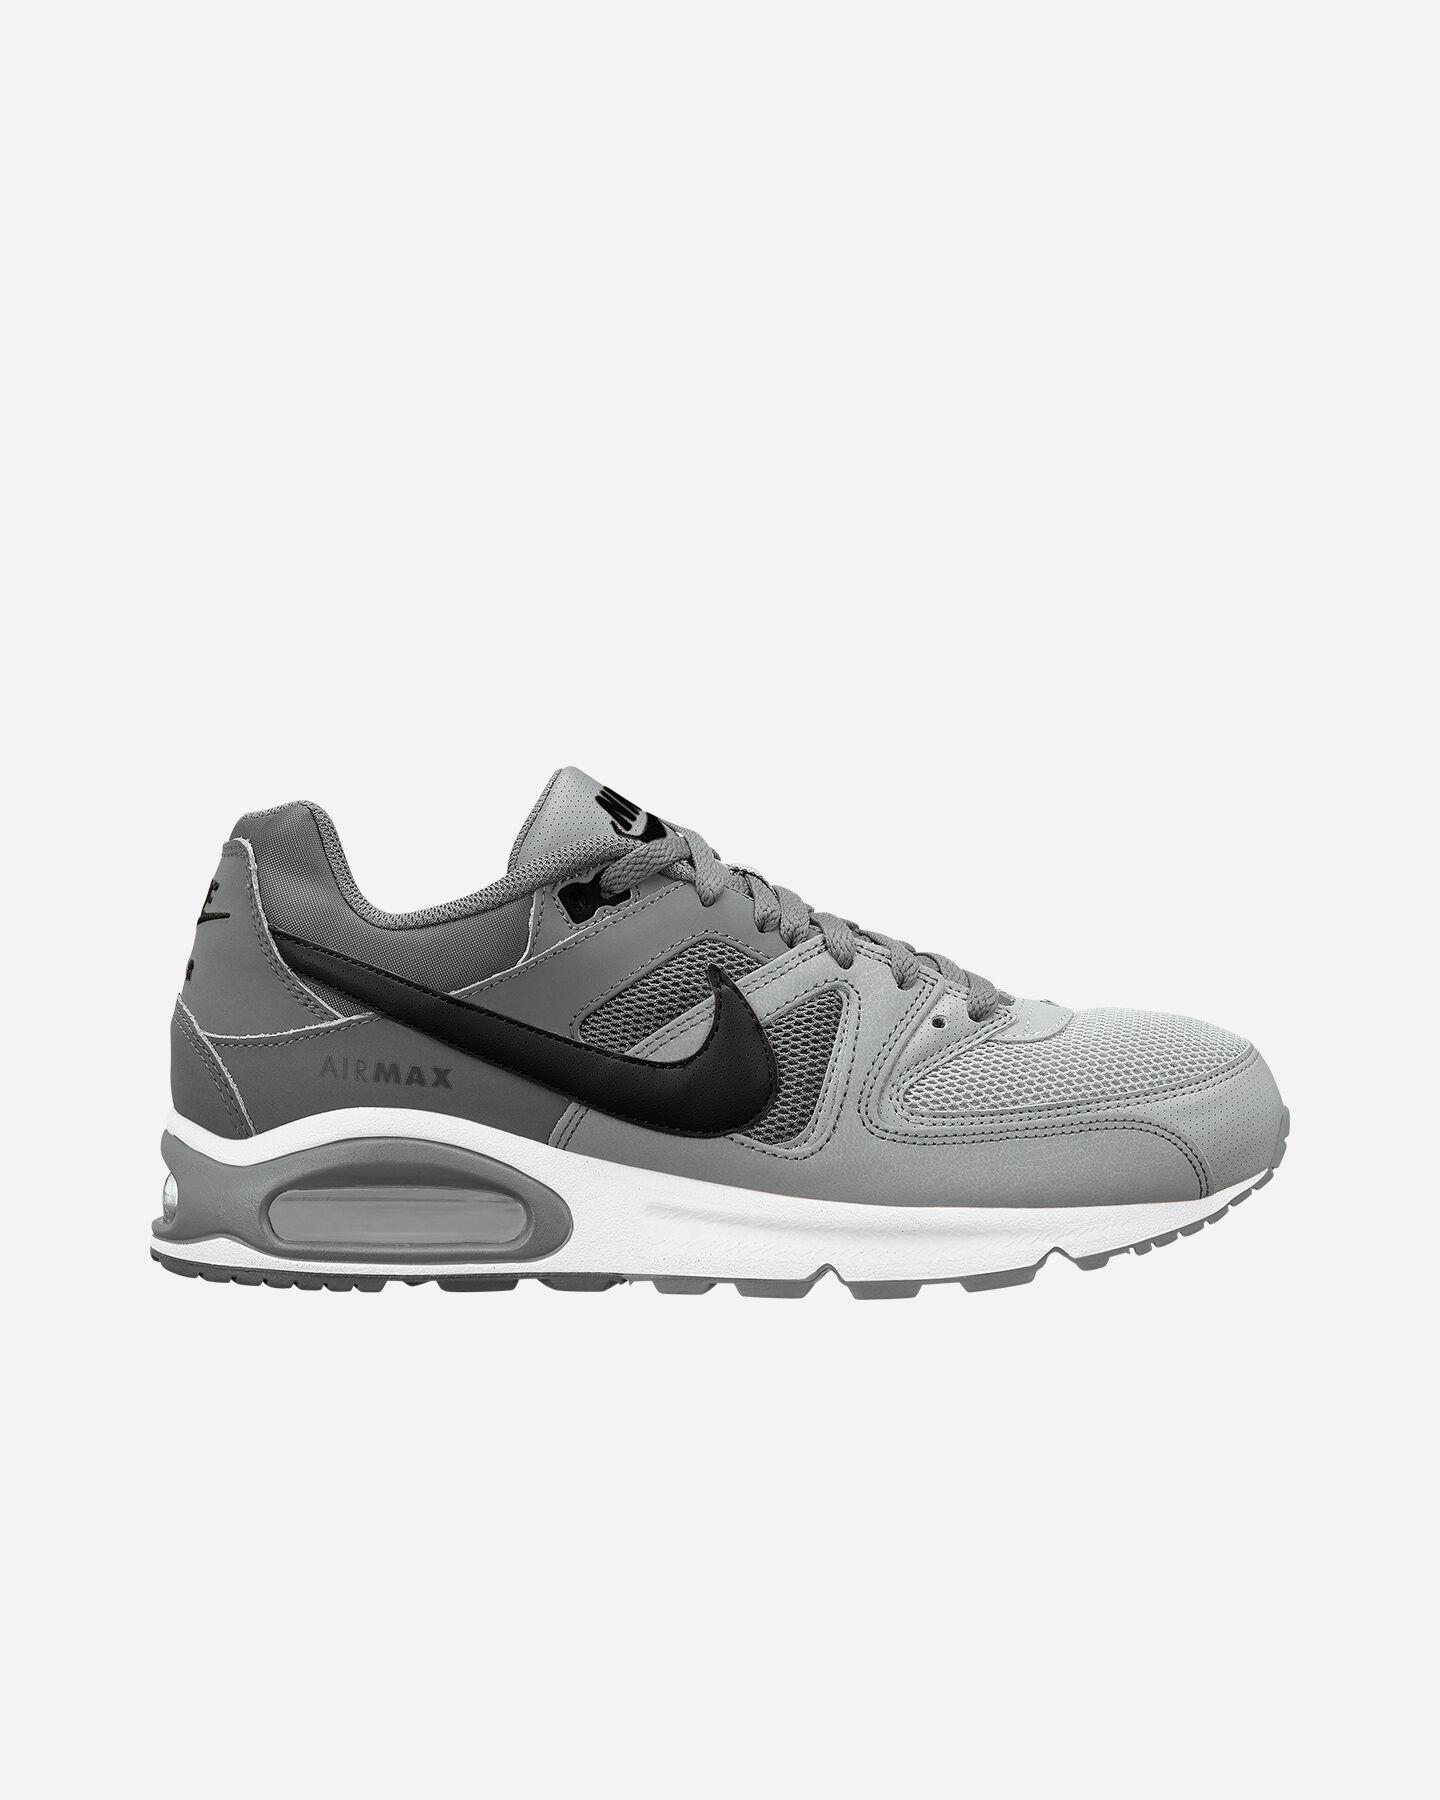 Scarpe sneakers NIKE AIR MAX COMMAND M S1296328 scatto 0